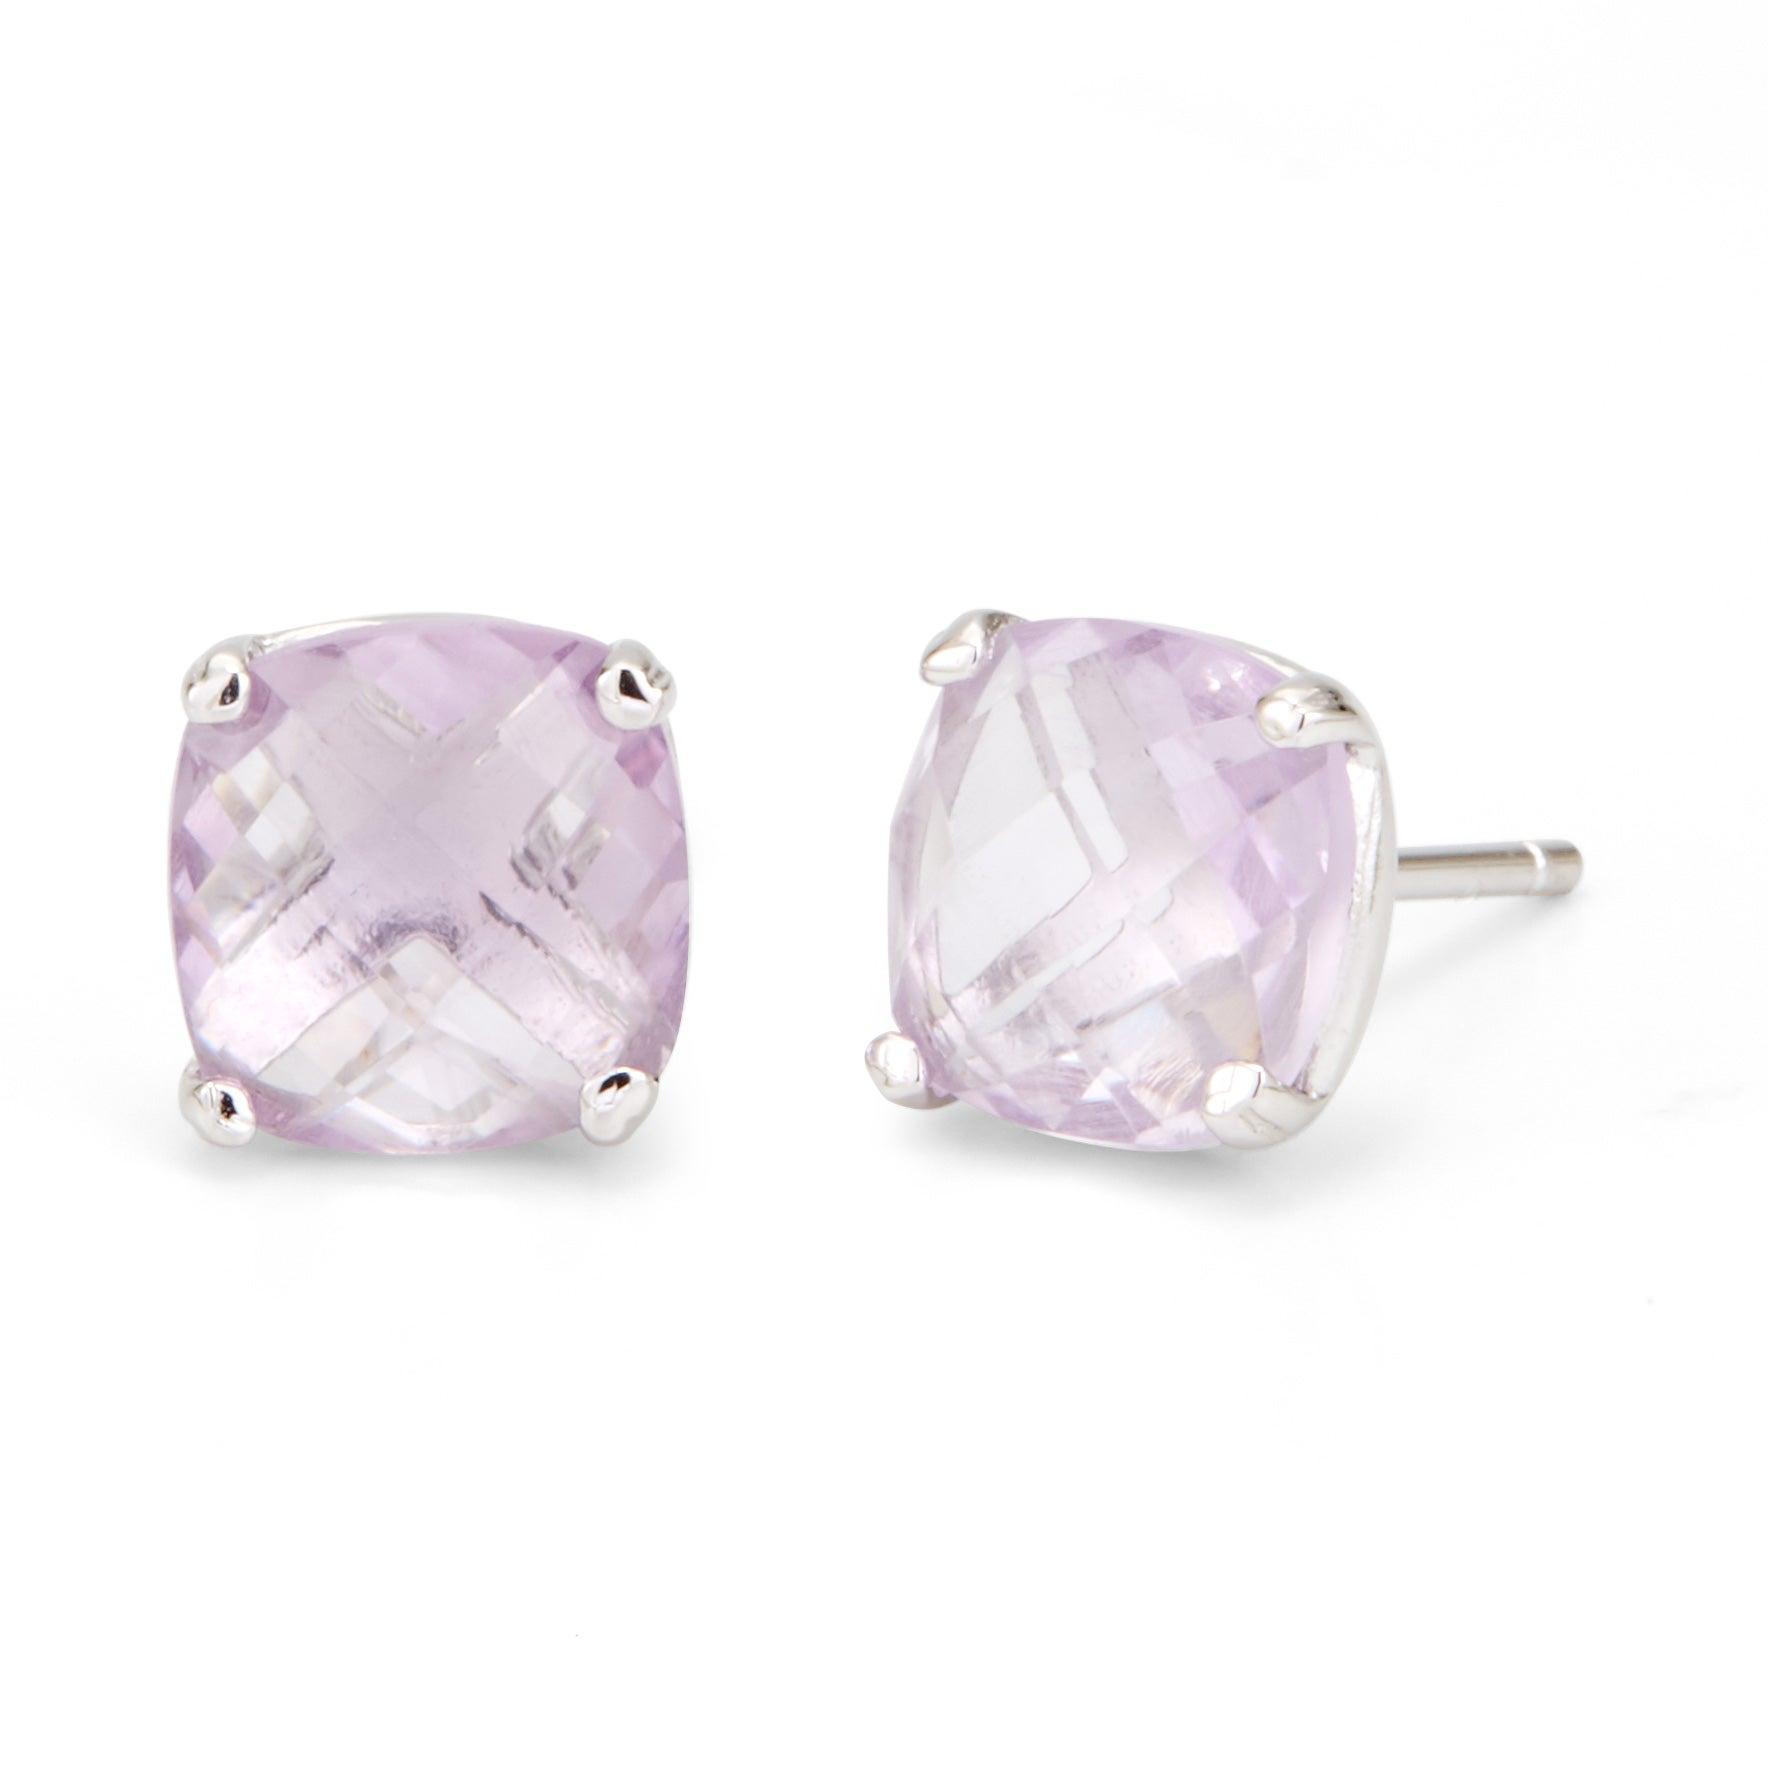 June Pink Amethyst Cushion Cut Gemstone Silver Earrings